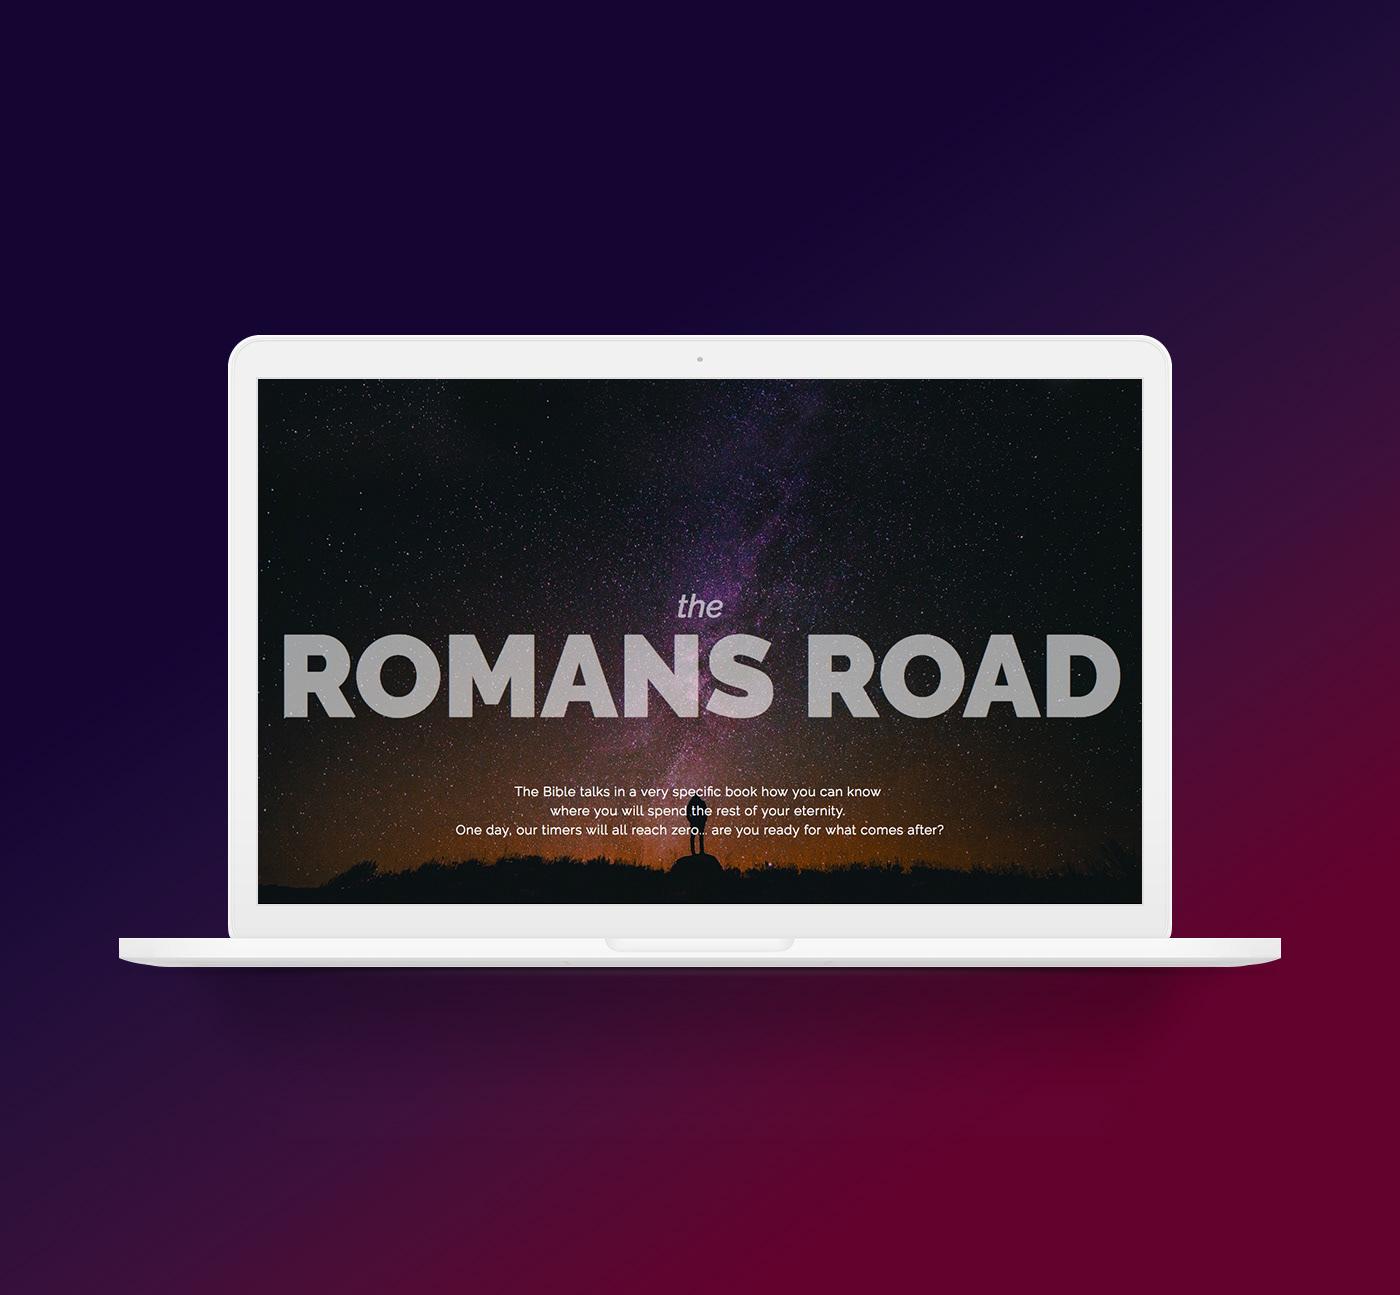 romans road main.jpg